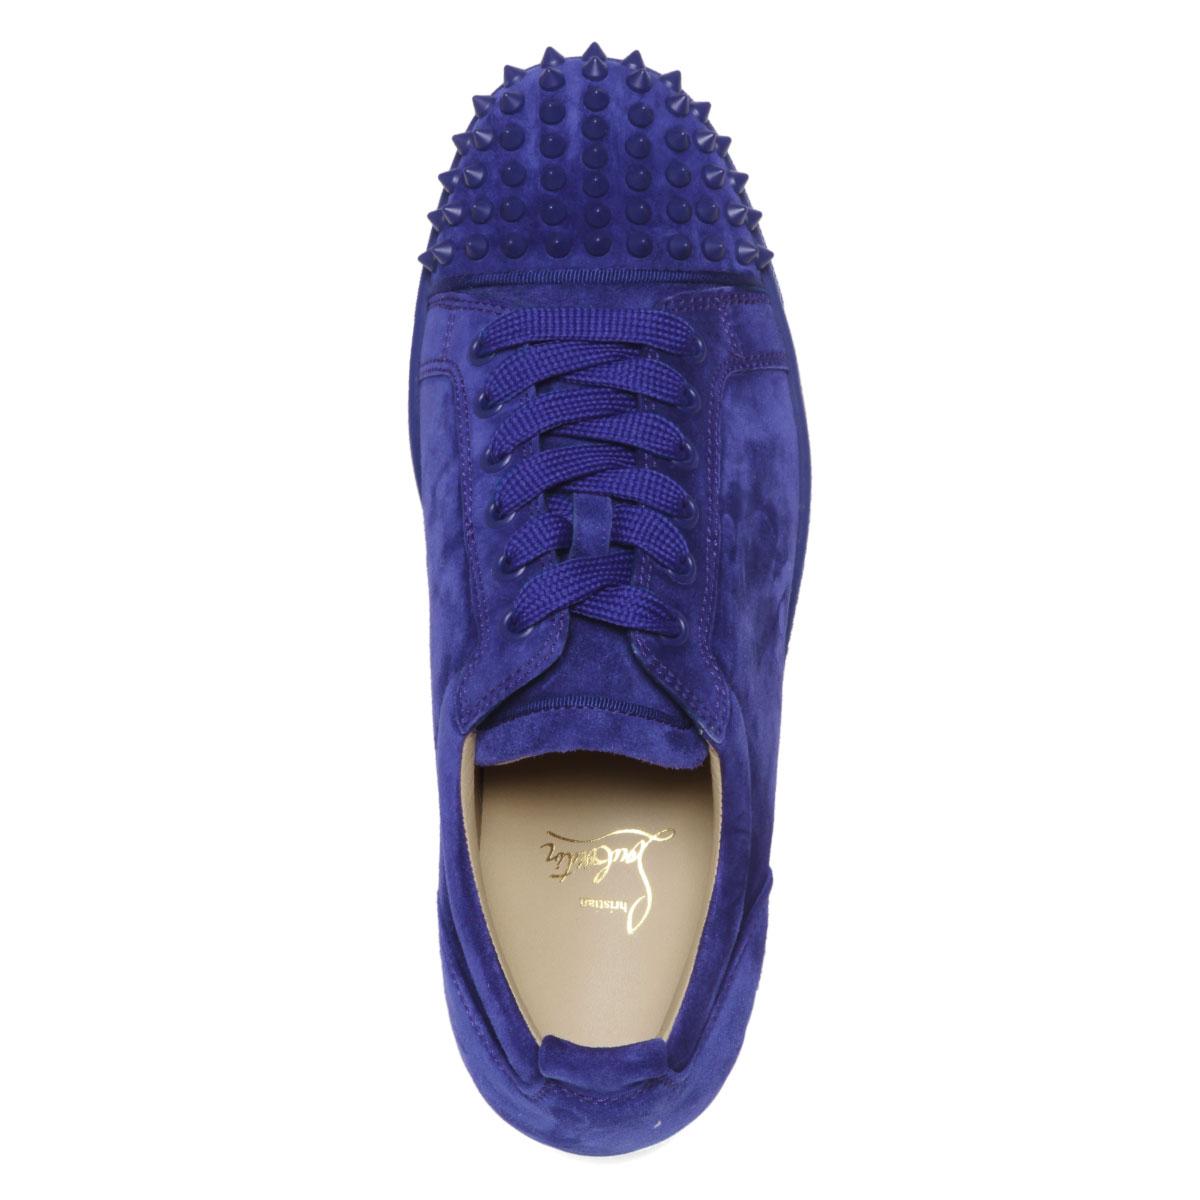 super popular 517b1 96874 1180051 クリスチャンルブタン Christian Louboutin shoes men V083 sneakers LOUIS JUNIOR  SPIKES FLAT Lewis Junius pike staple fiber rat NOMADE/NOMADE MAT blue